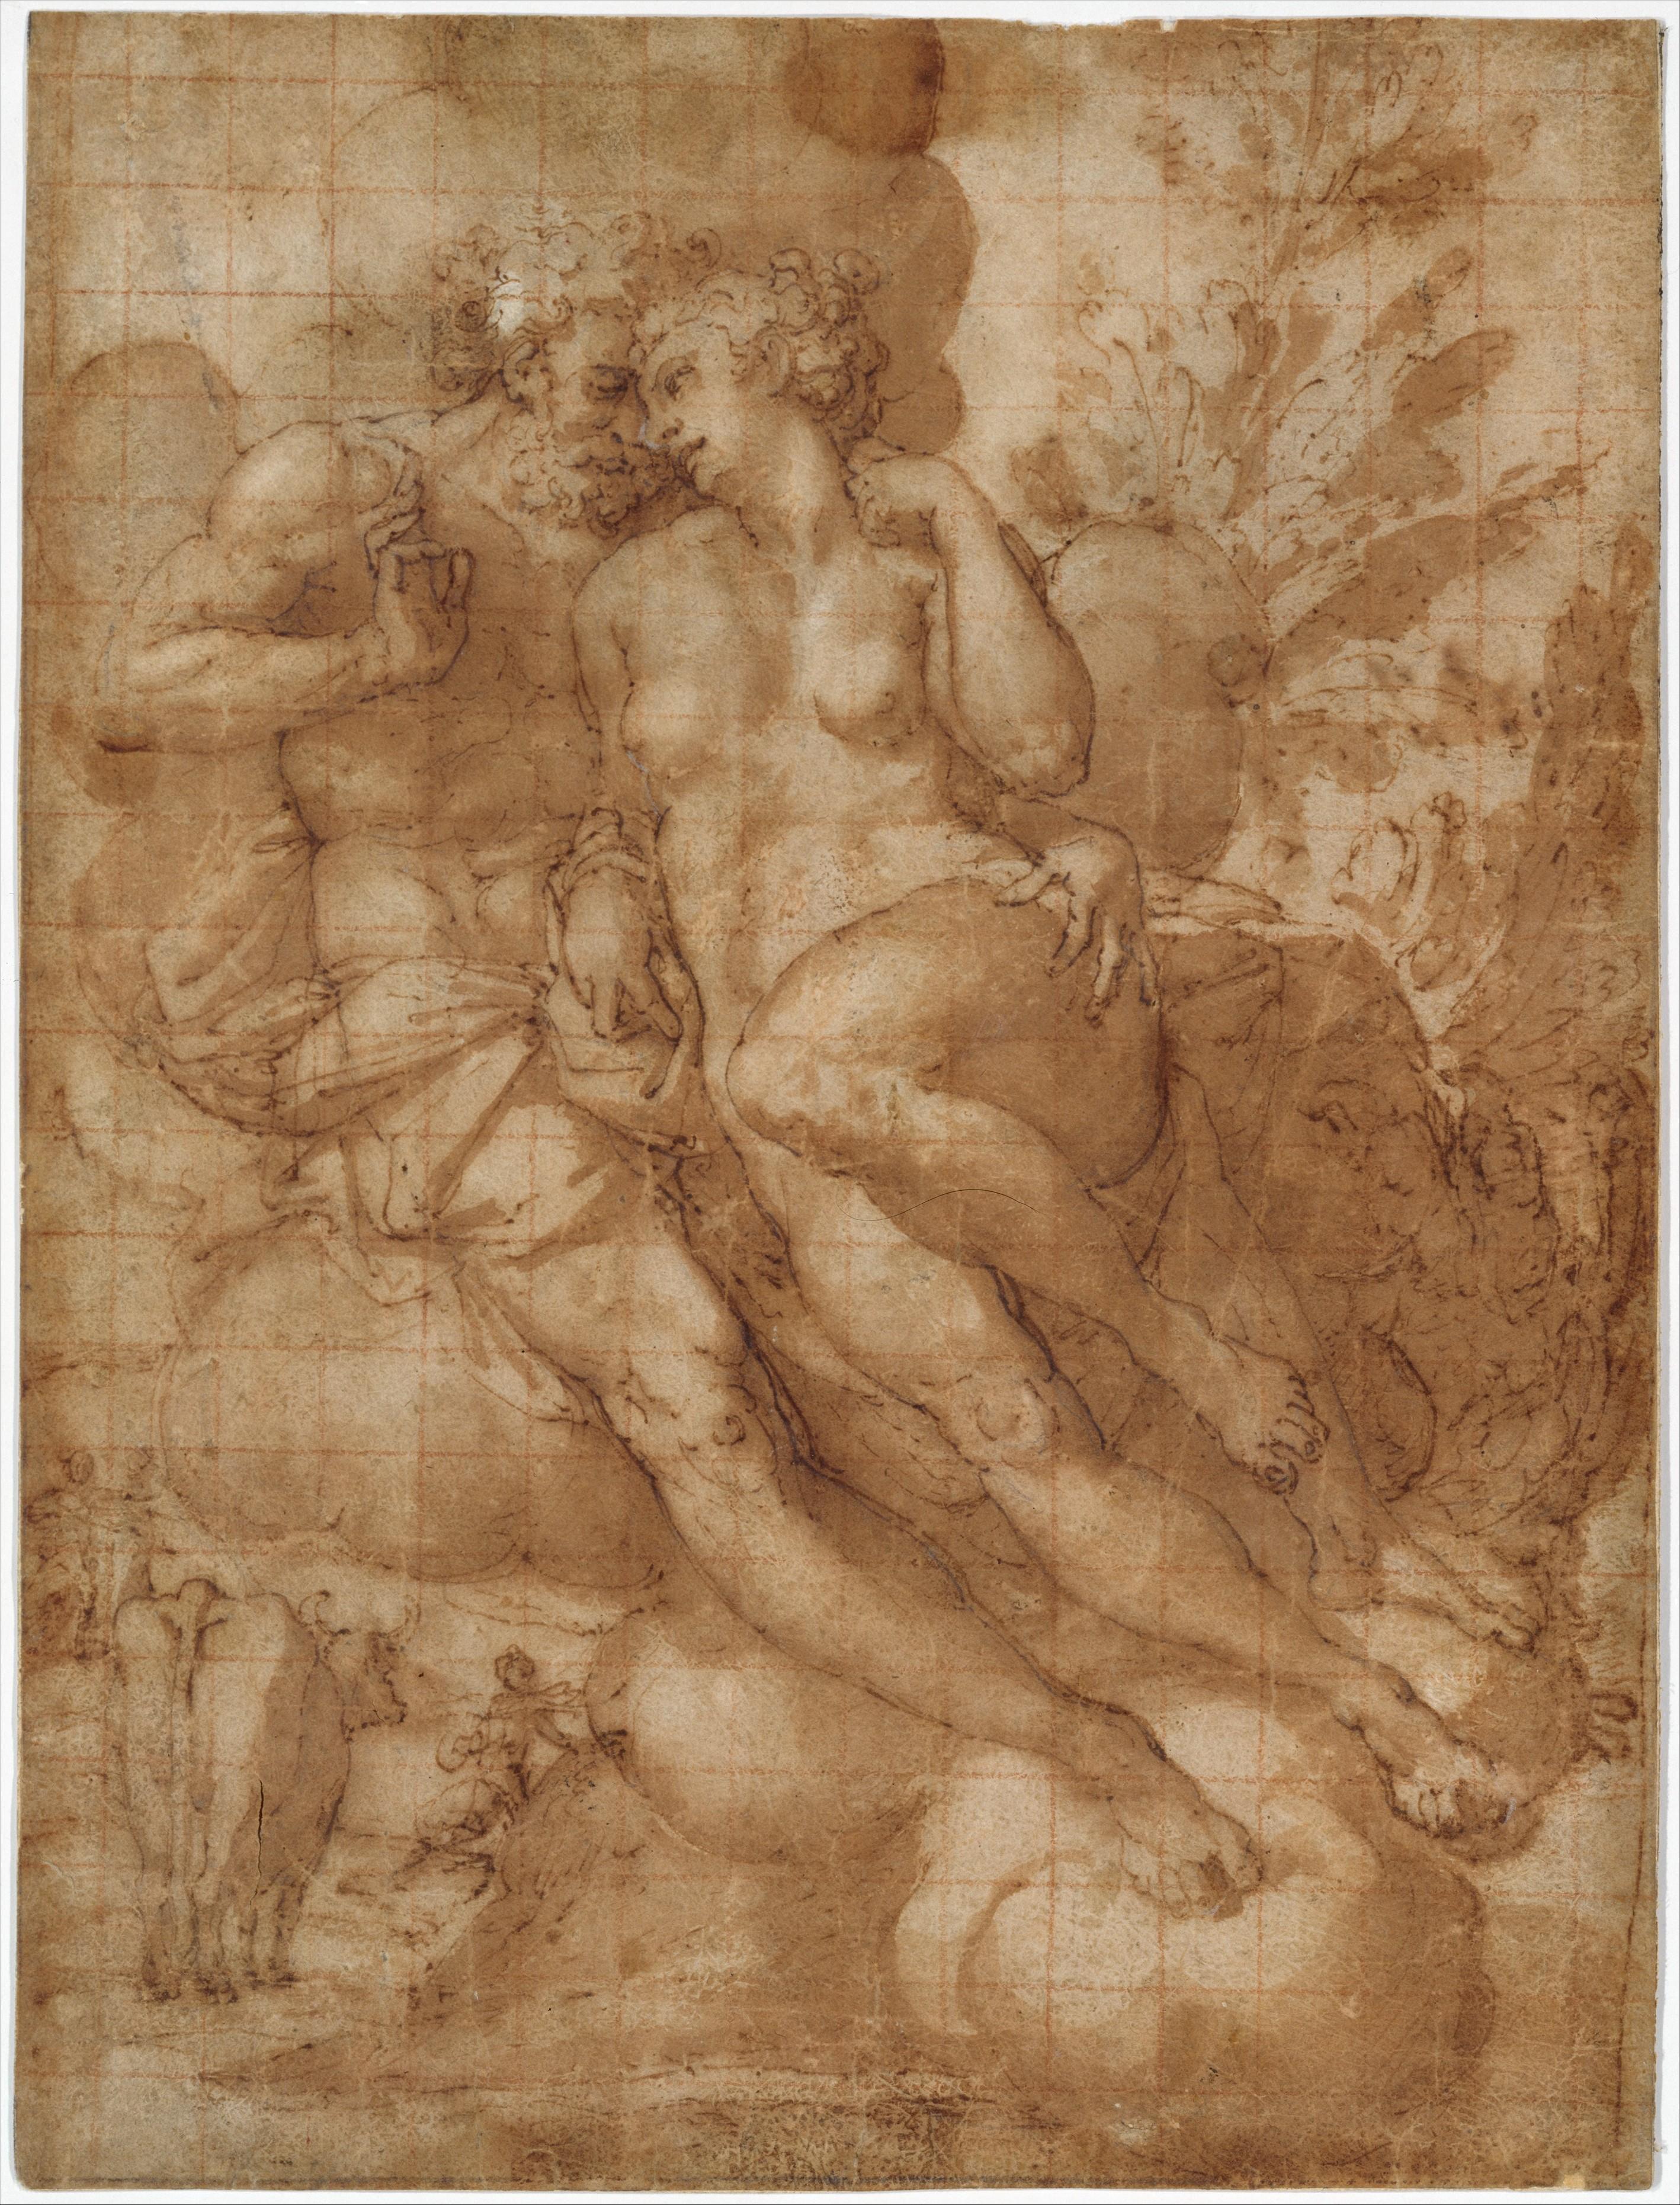 Francesco Salviati Drawings Attributed to Francesco